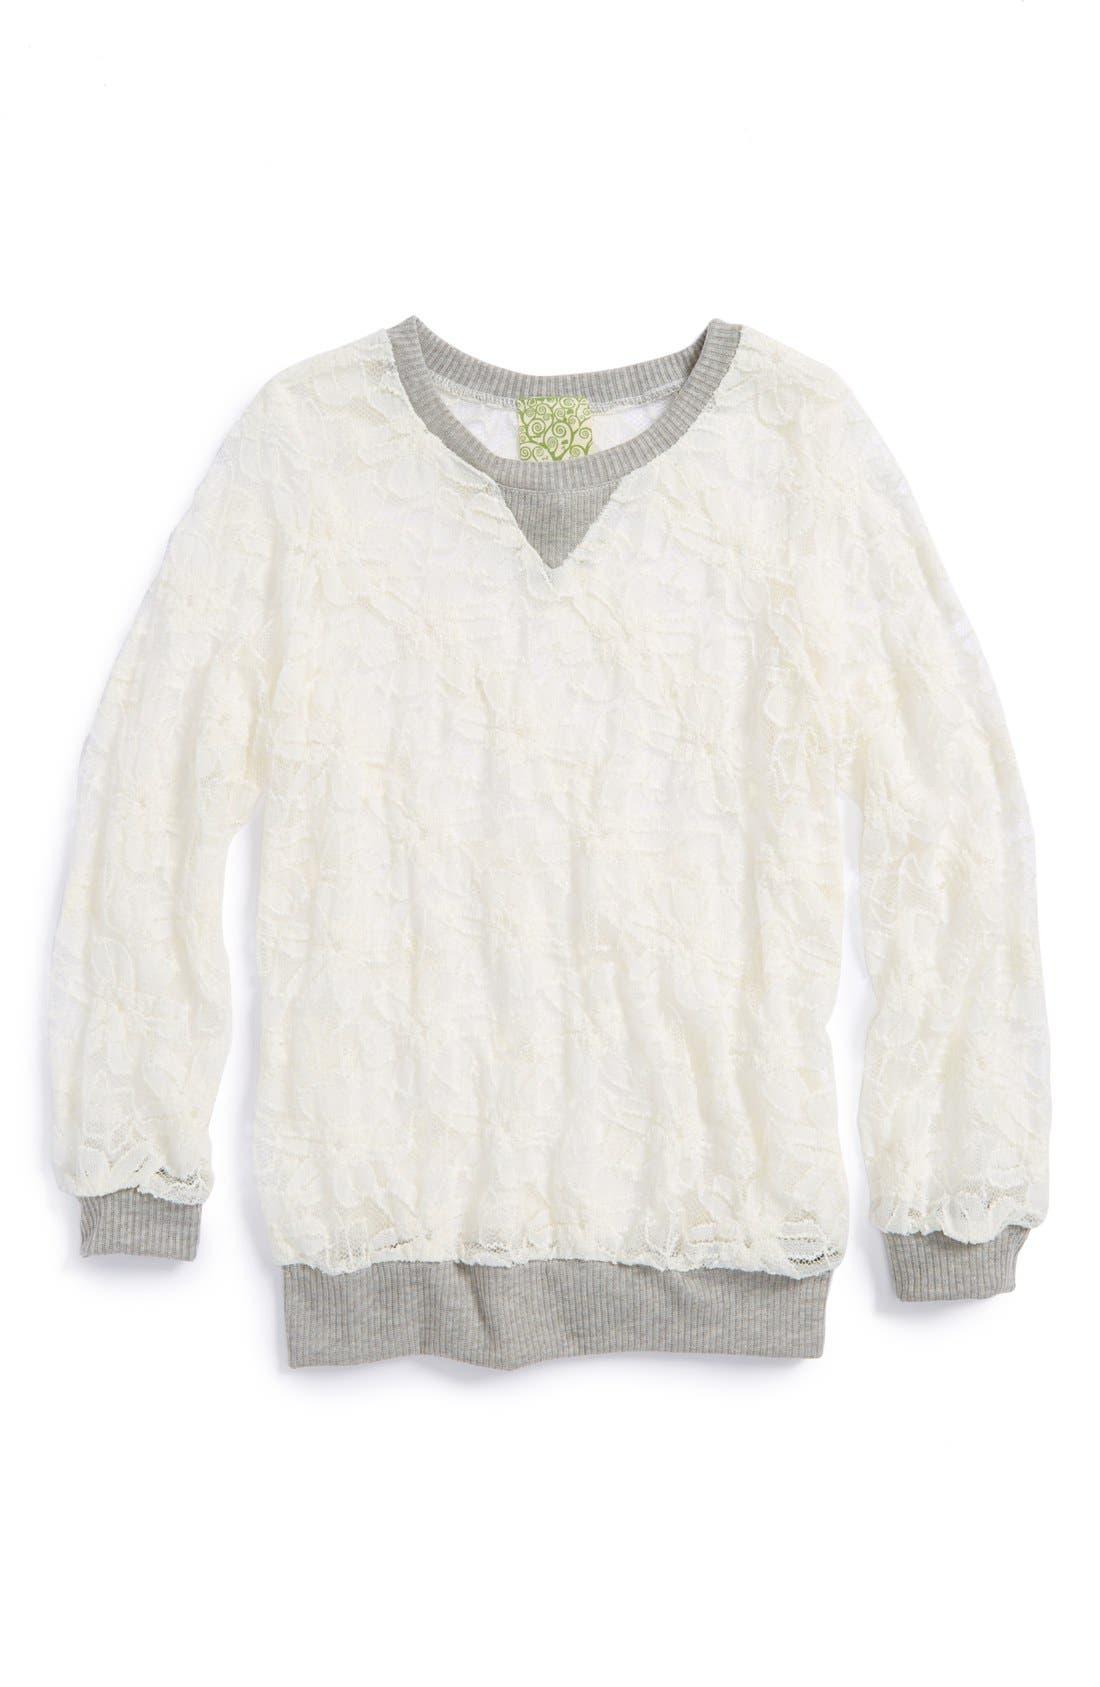 Main Image - Kiddo Sheer Floral Lace Sweatshirt (Big Girls)